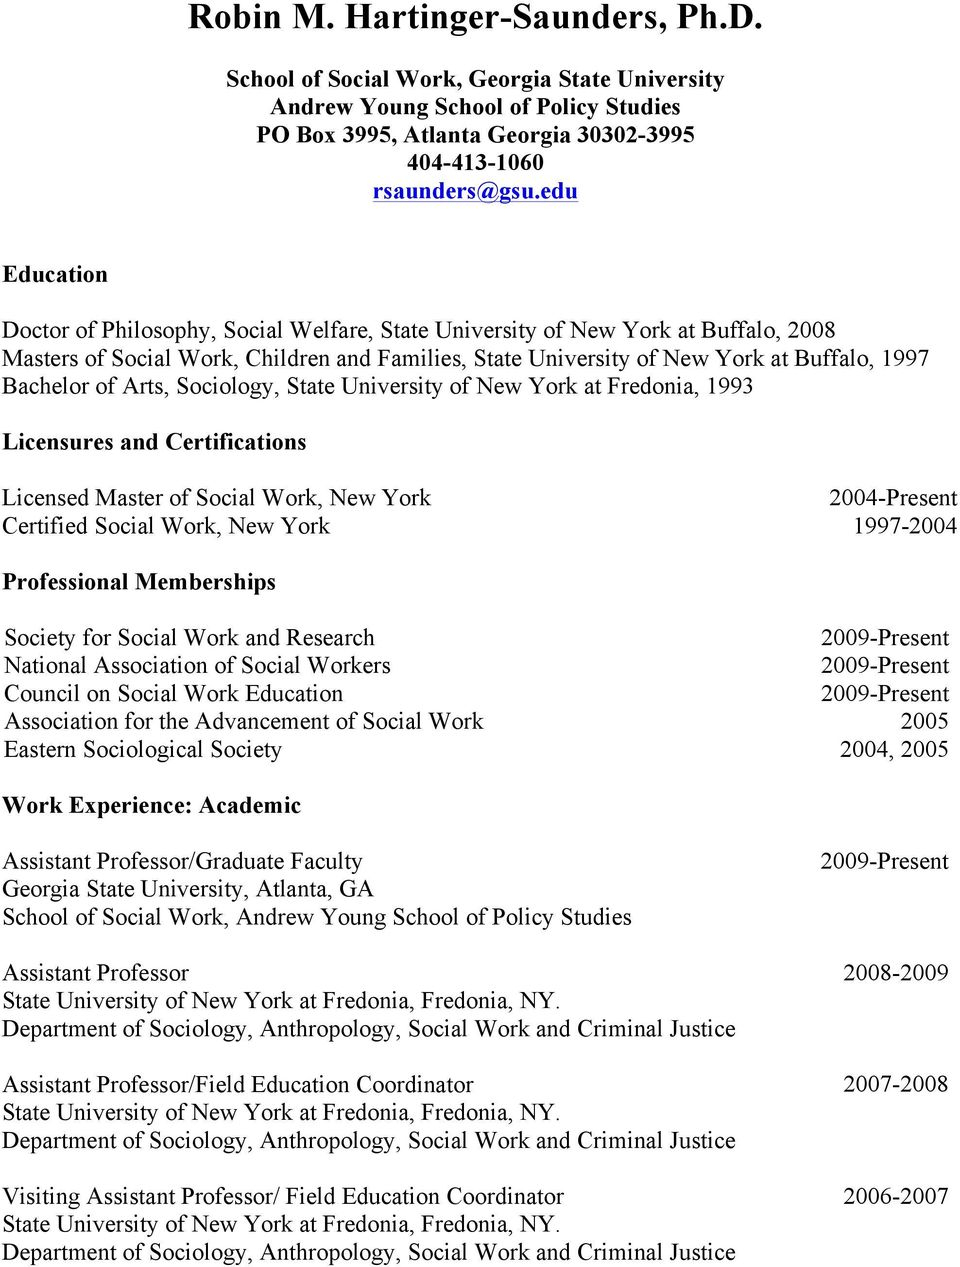 Robin M. Hartinger Saunders, Ph.d. – Pdf Free Download Pertaining To Georgia State University Semester Start Date 2004 – 2005